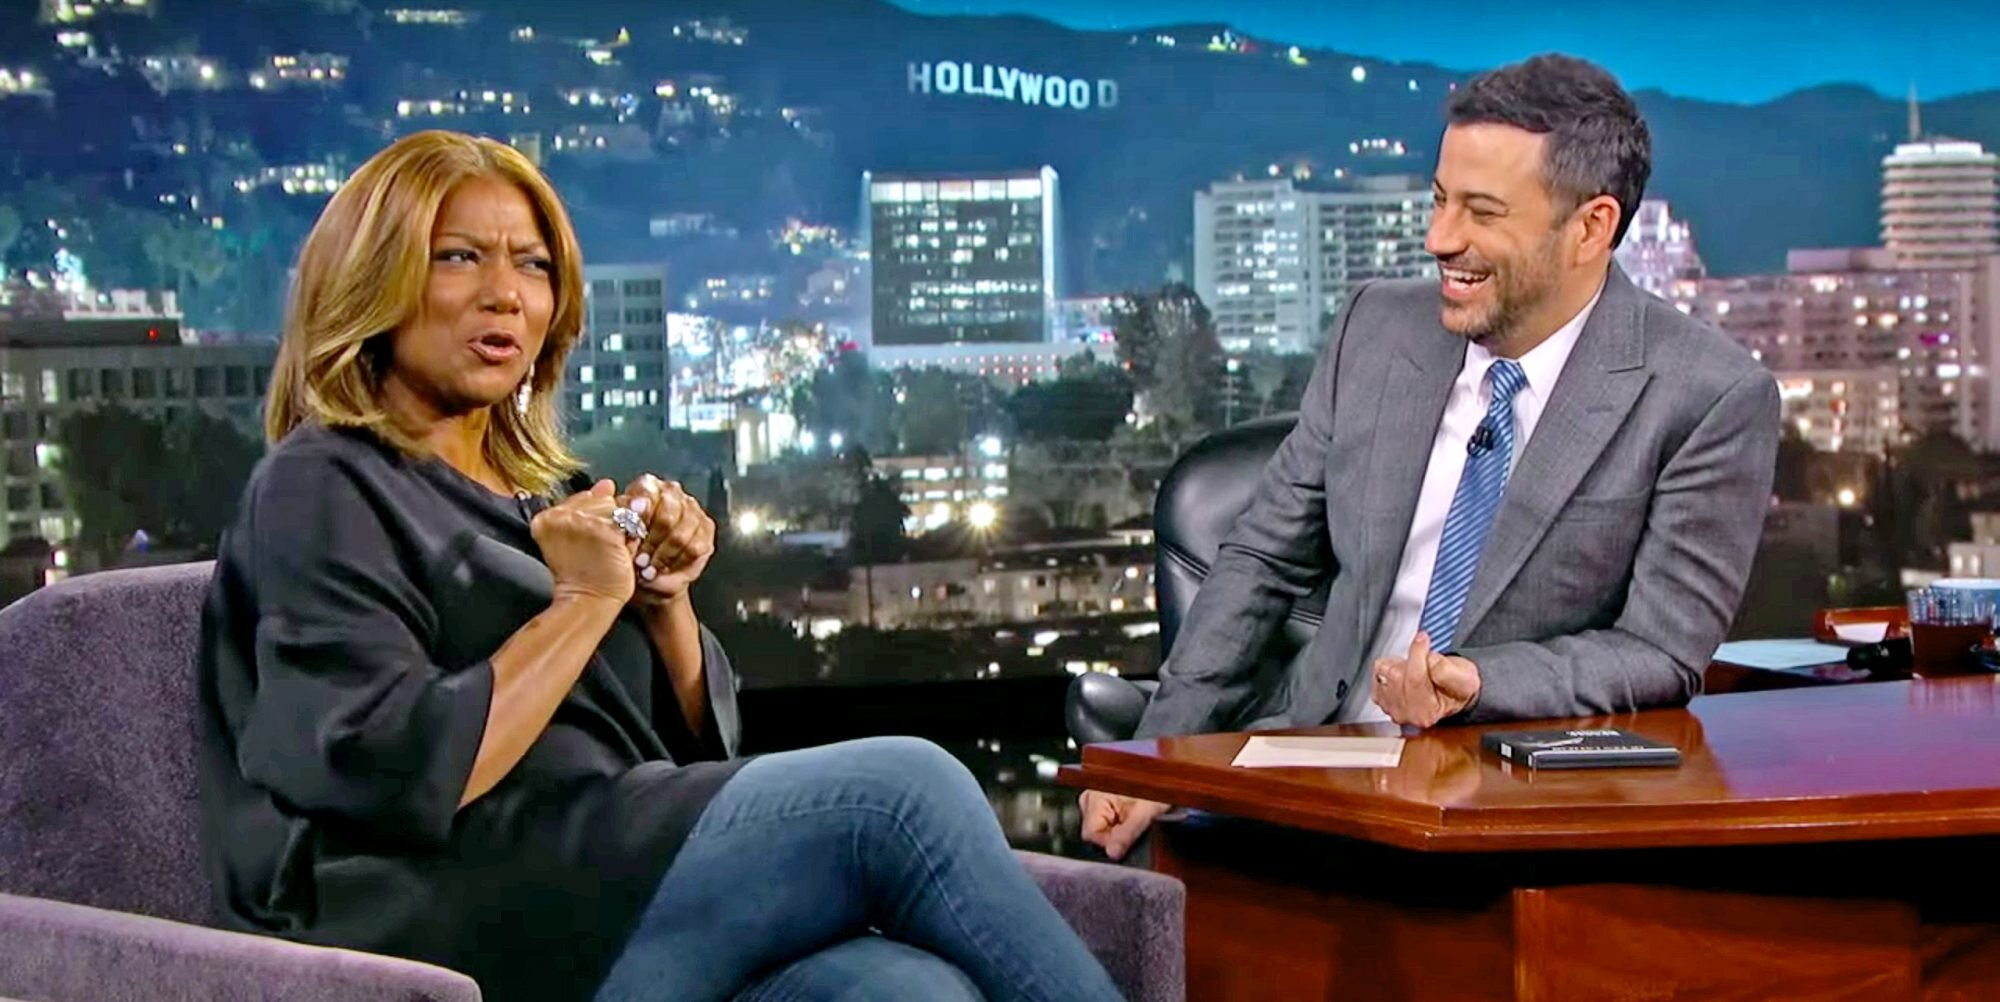 Queen Latifah Chris Martin Paid 100 000 So She Could Have Alicia Keys Piano Ew Com